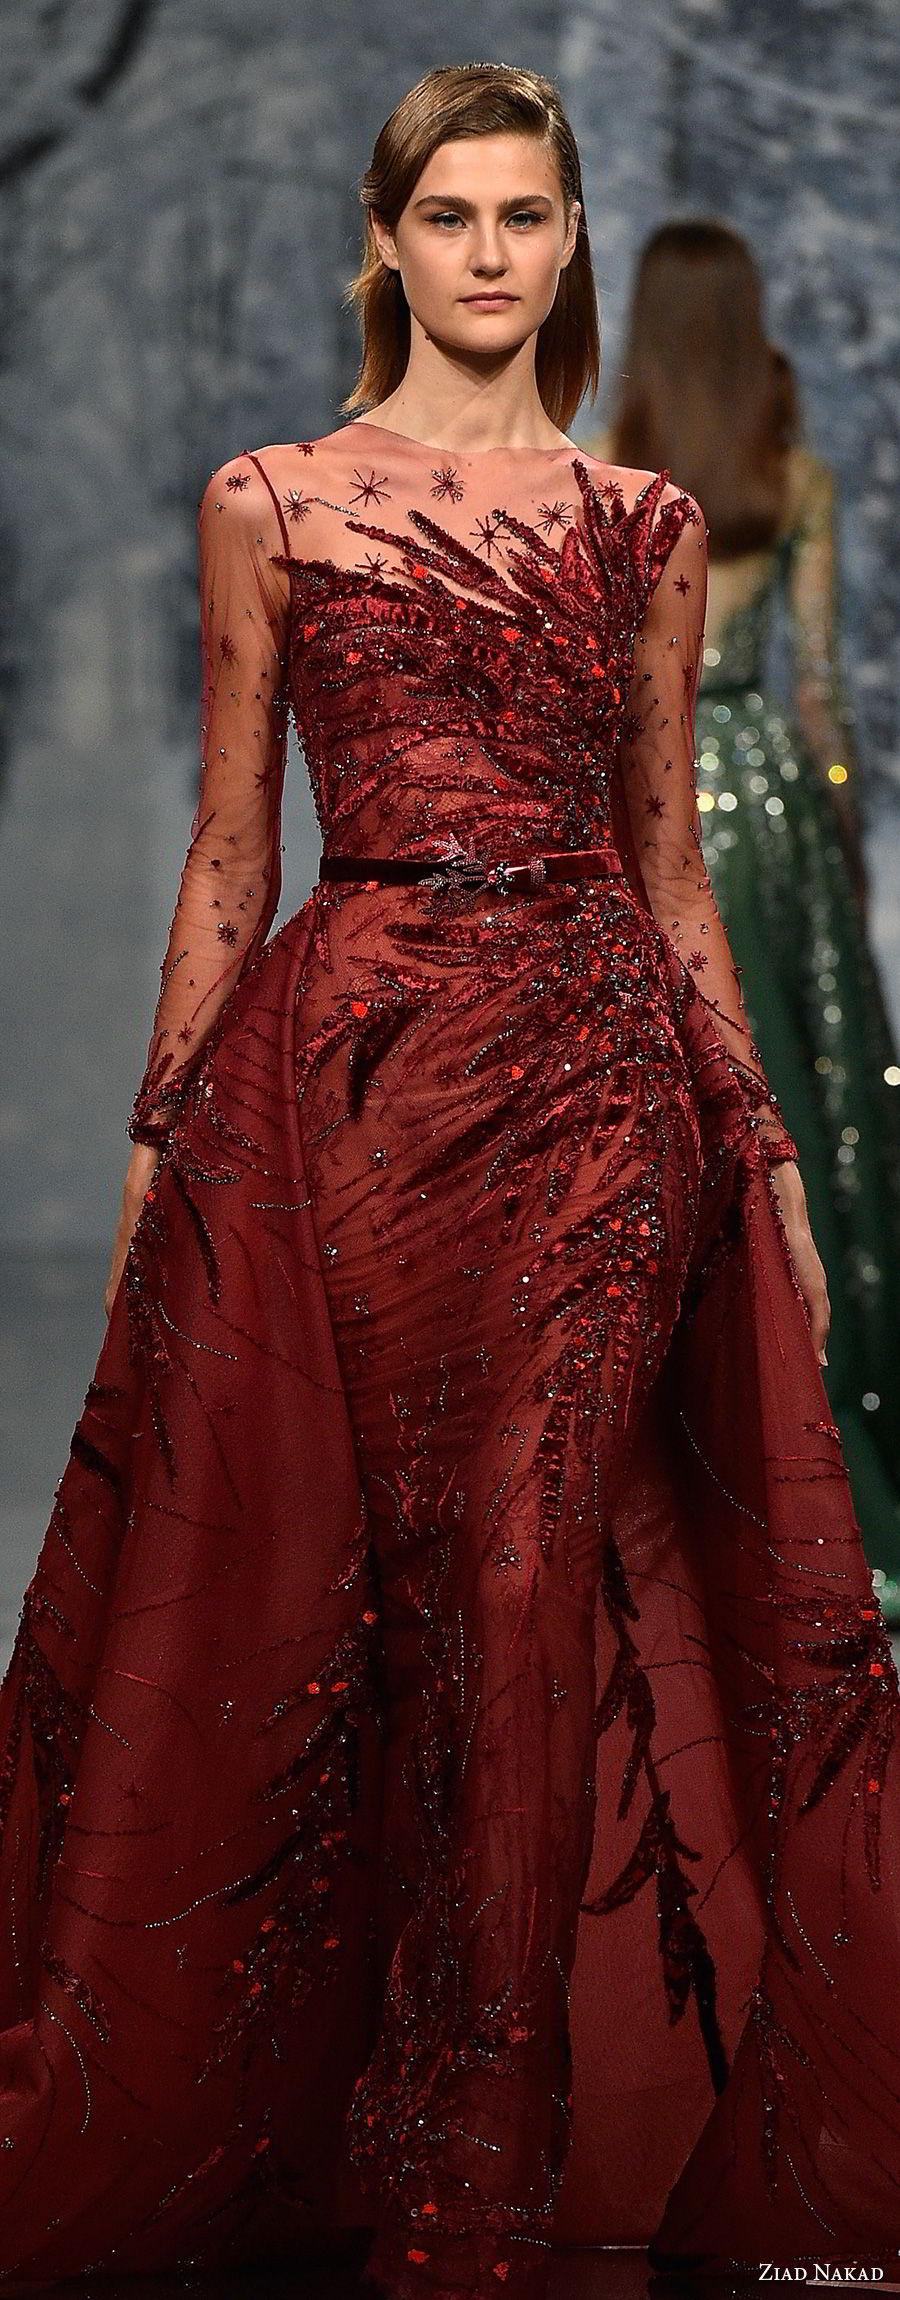 ziad nakad couture fall 2017 long sleeves illusion jewel heavily beaded embellishment glamorous red sheath wedding dress a  line overskirt sheer button back chapel train (21) lv